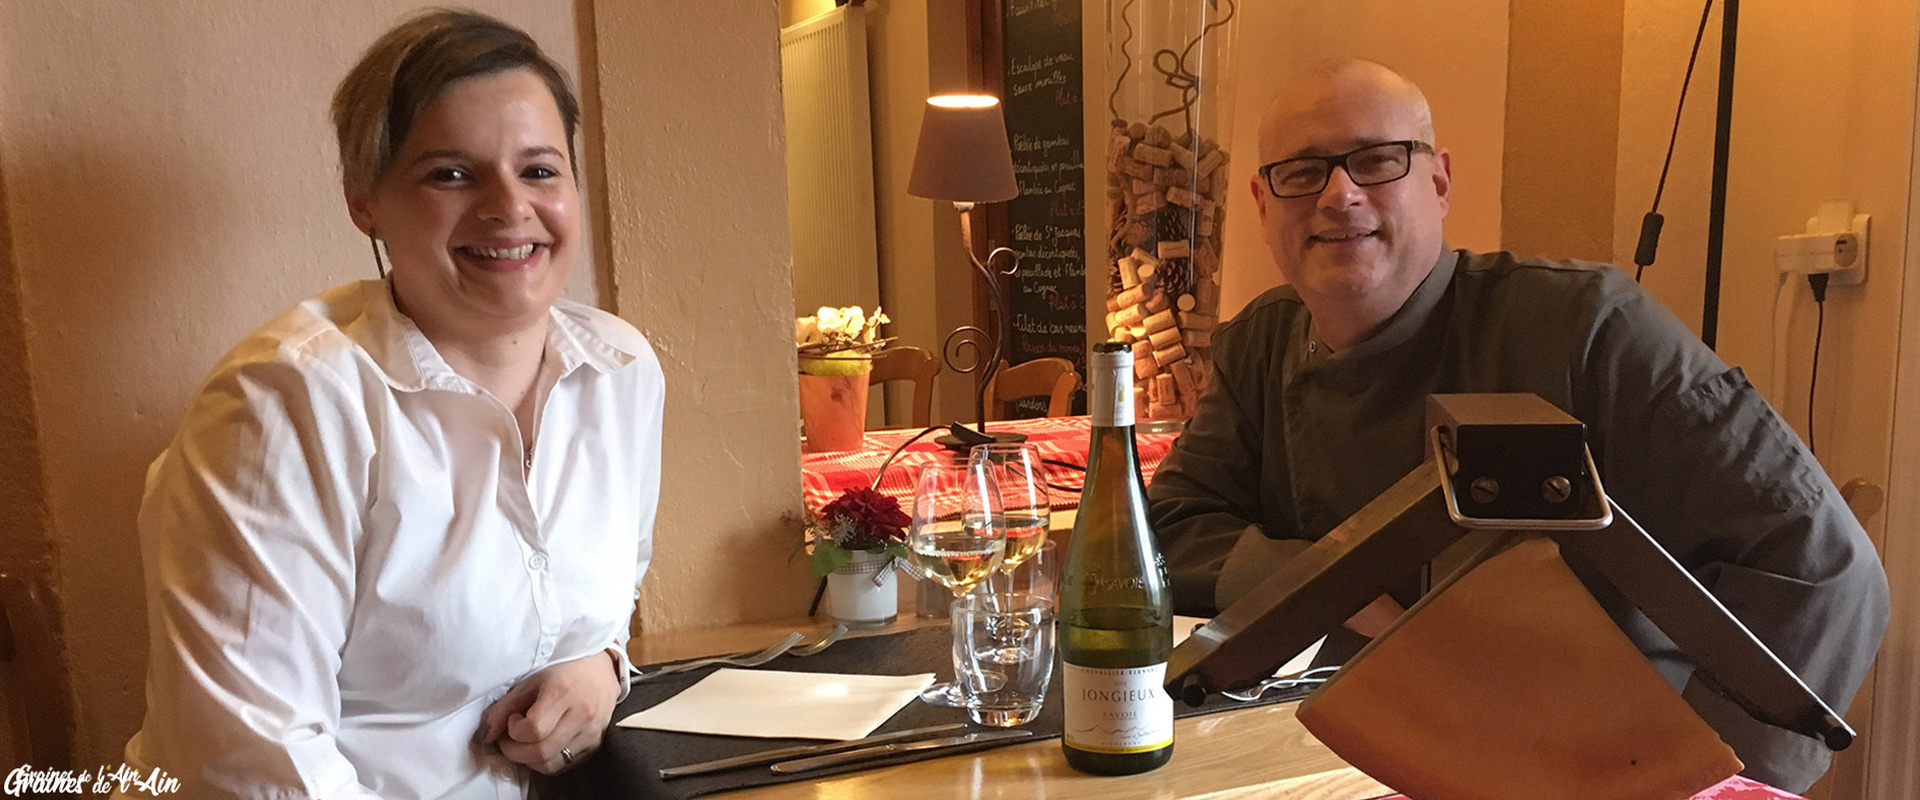 Restaurant Le Chalet Gourmand - Oyonnax - Graines de l'Ain